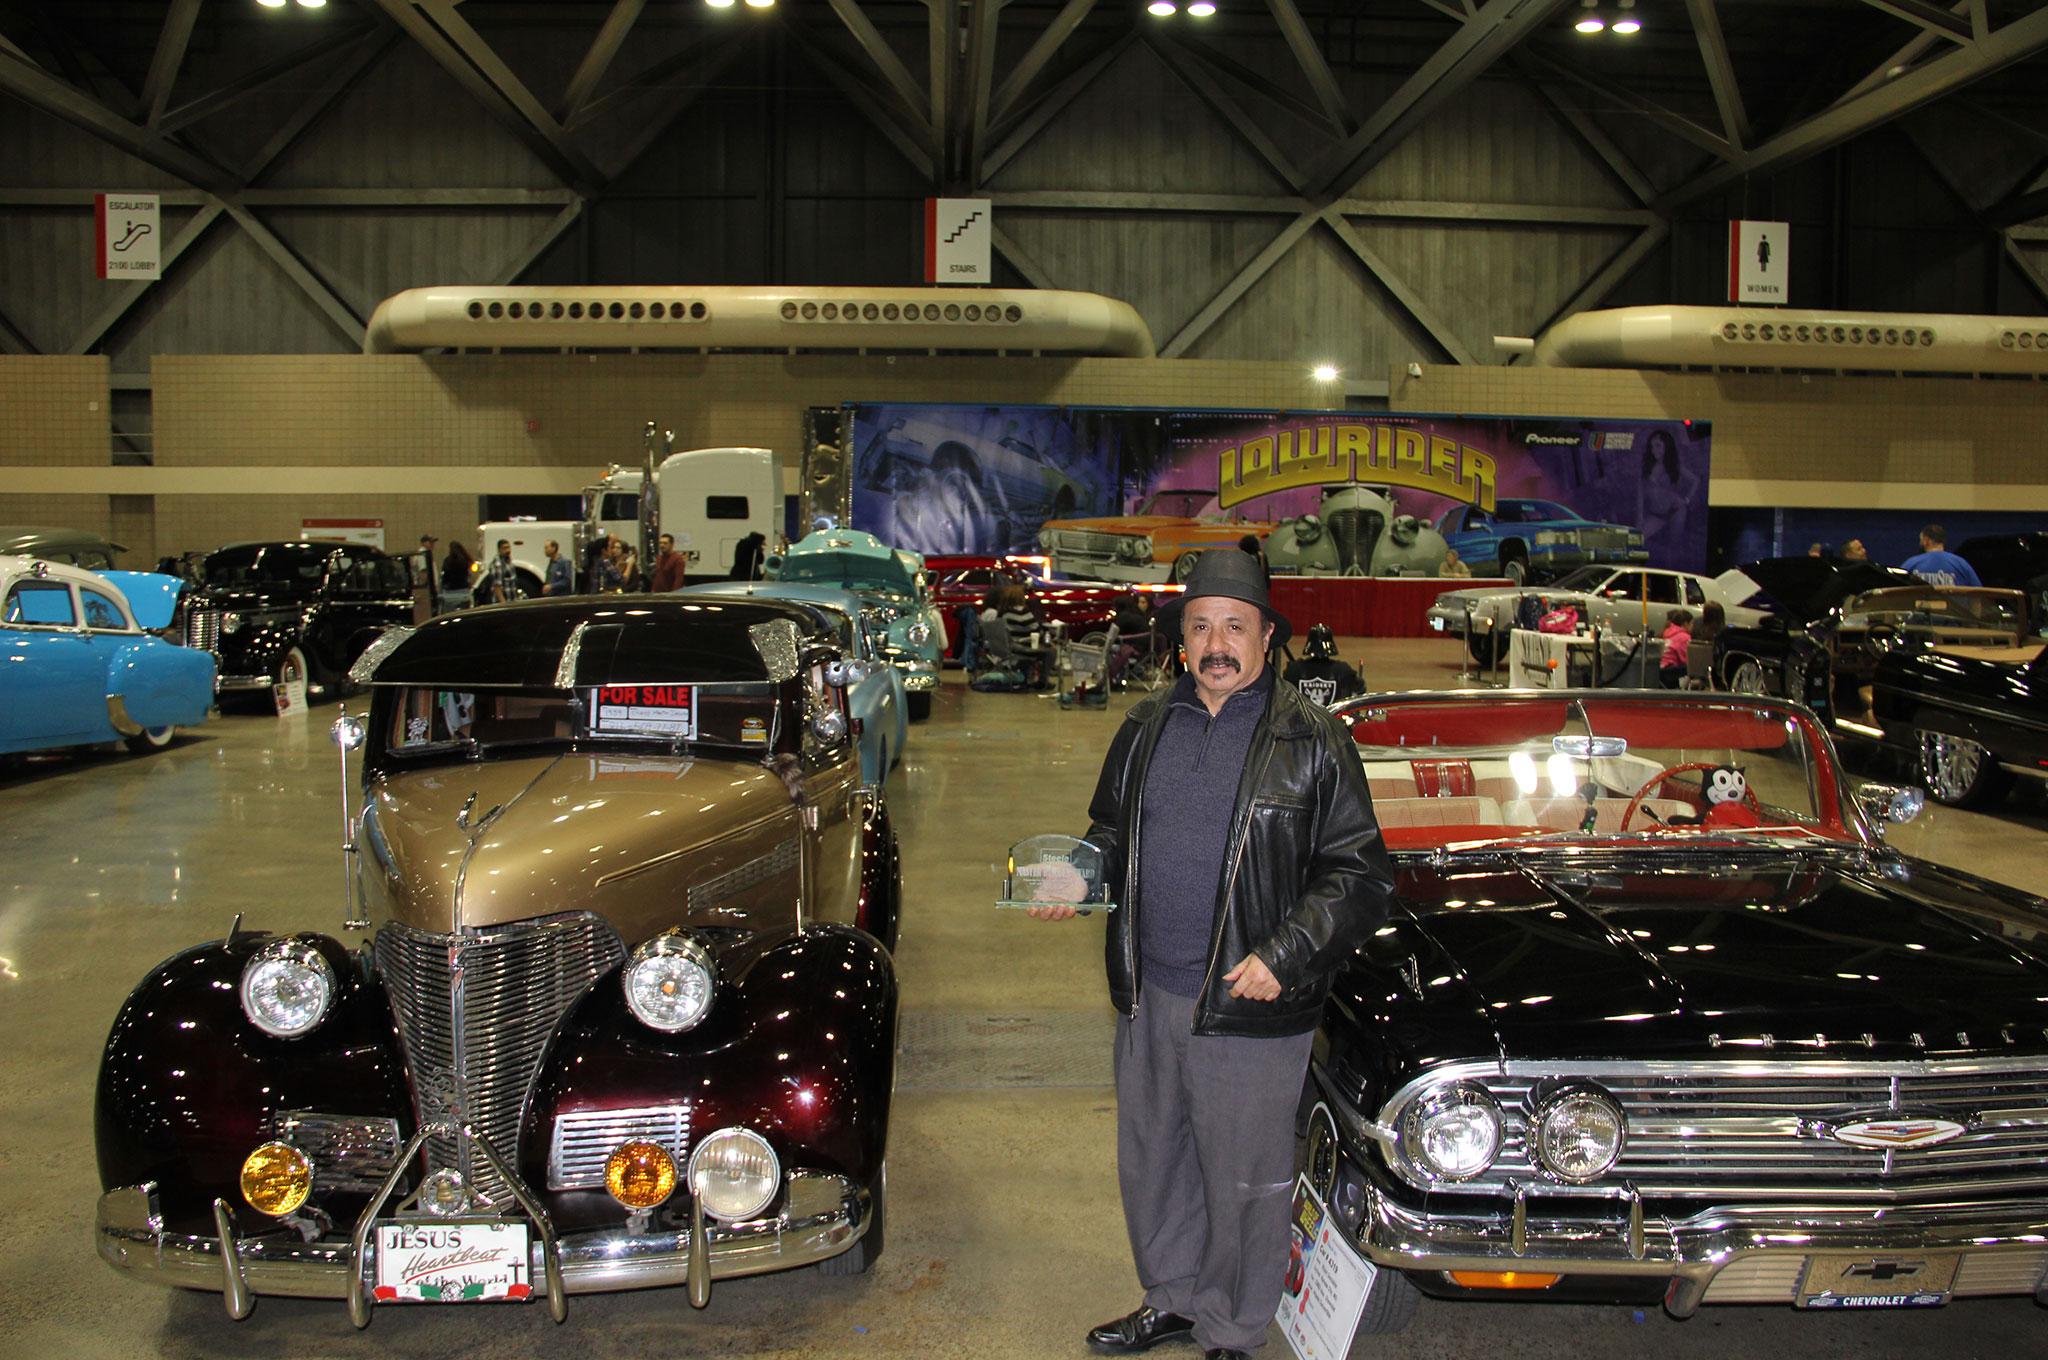 Kansas City World of Wheels - Feb 10-12, 2017